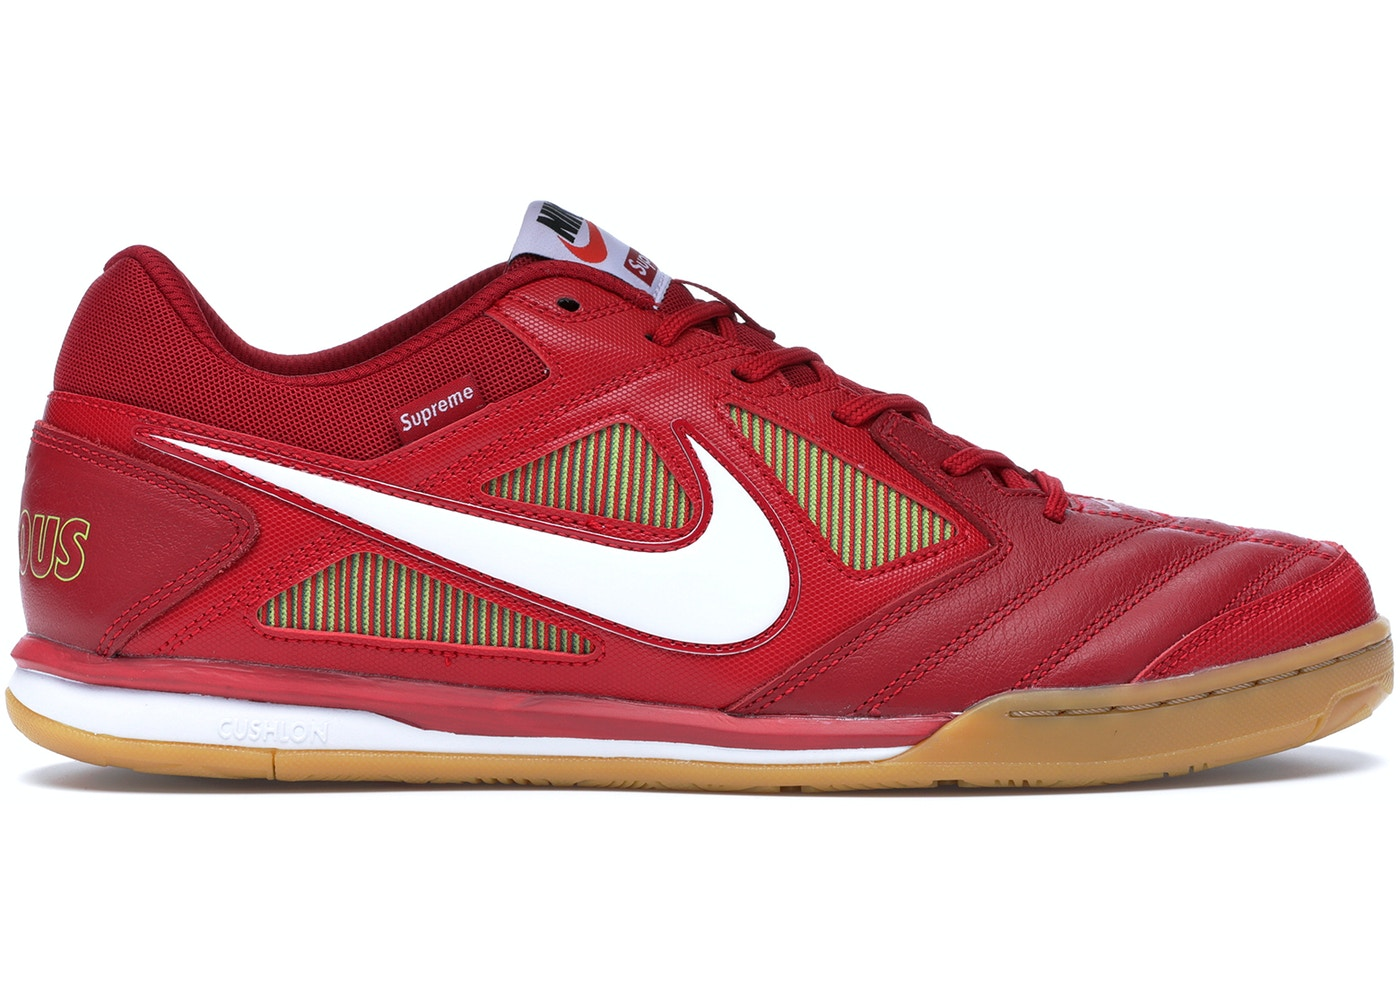 55bde668 Nike SB Gato Supreme Red - AR9821-600